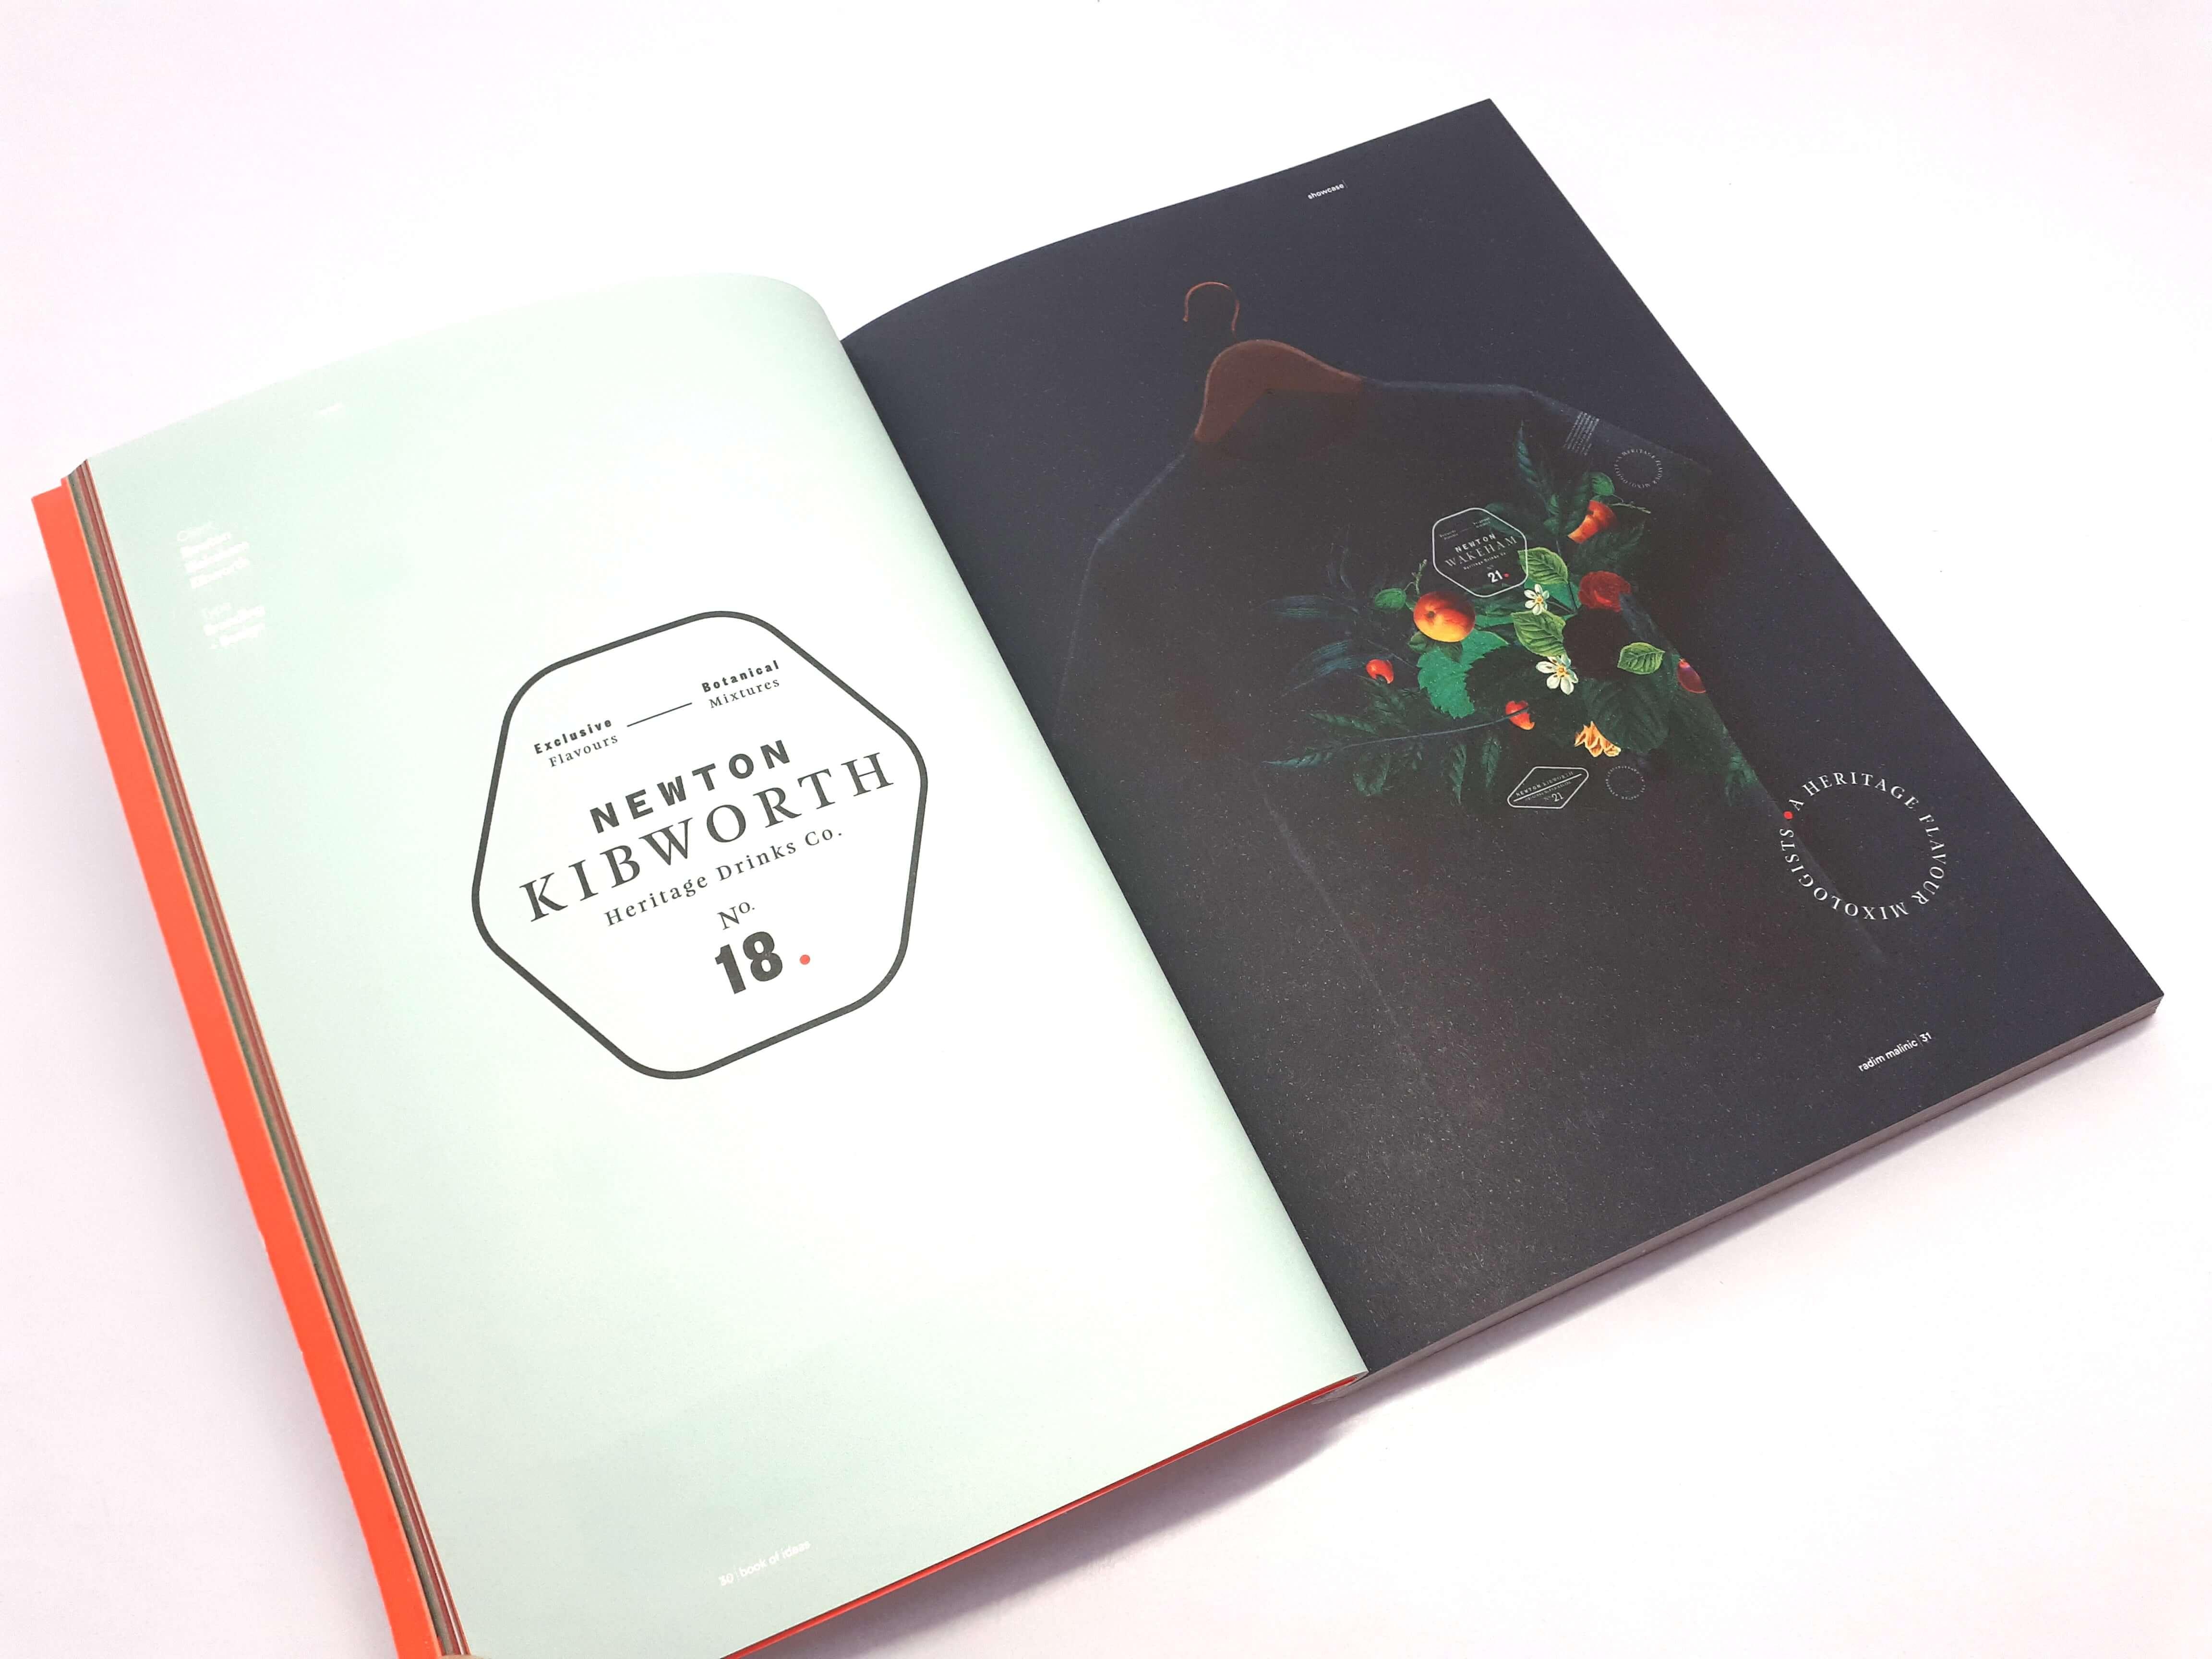 Book of ideas Volume 2 by Radim Malinic